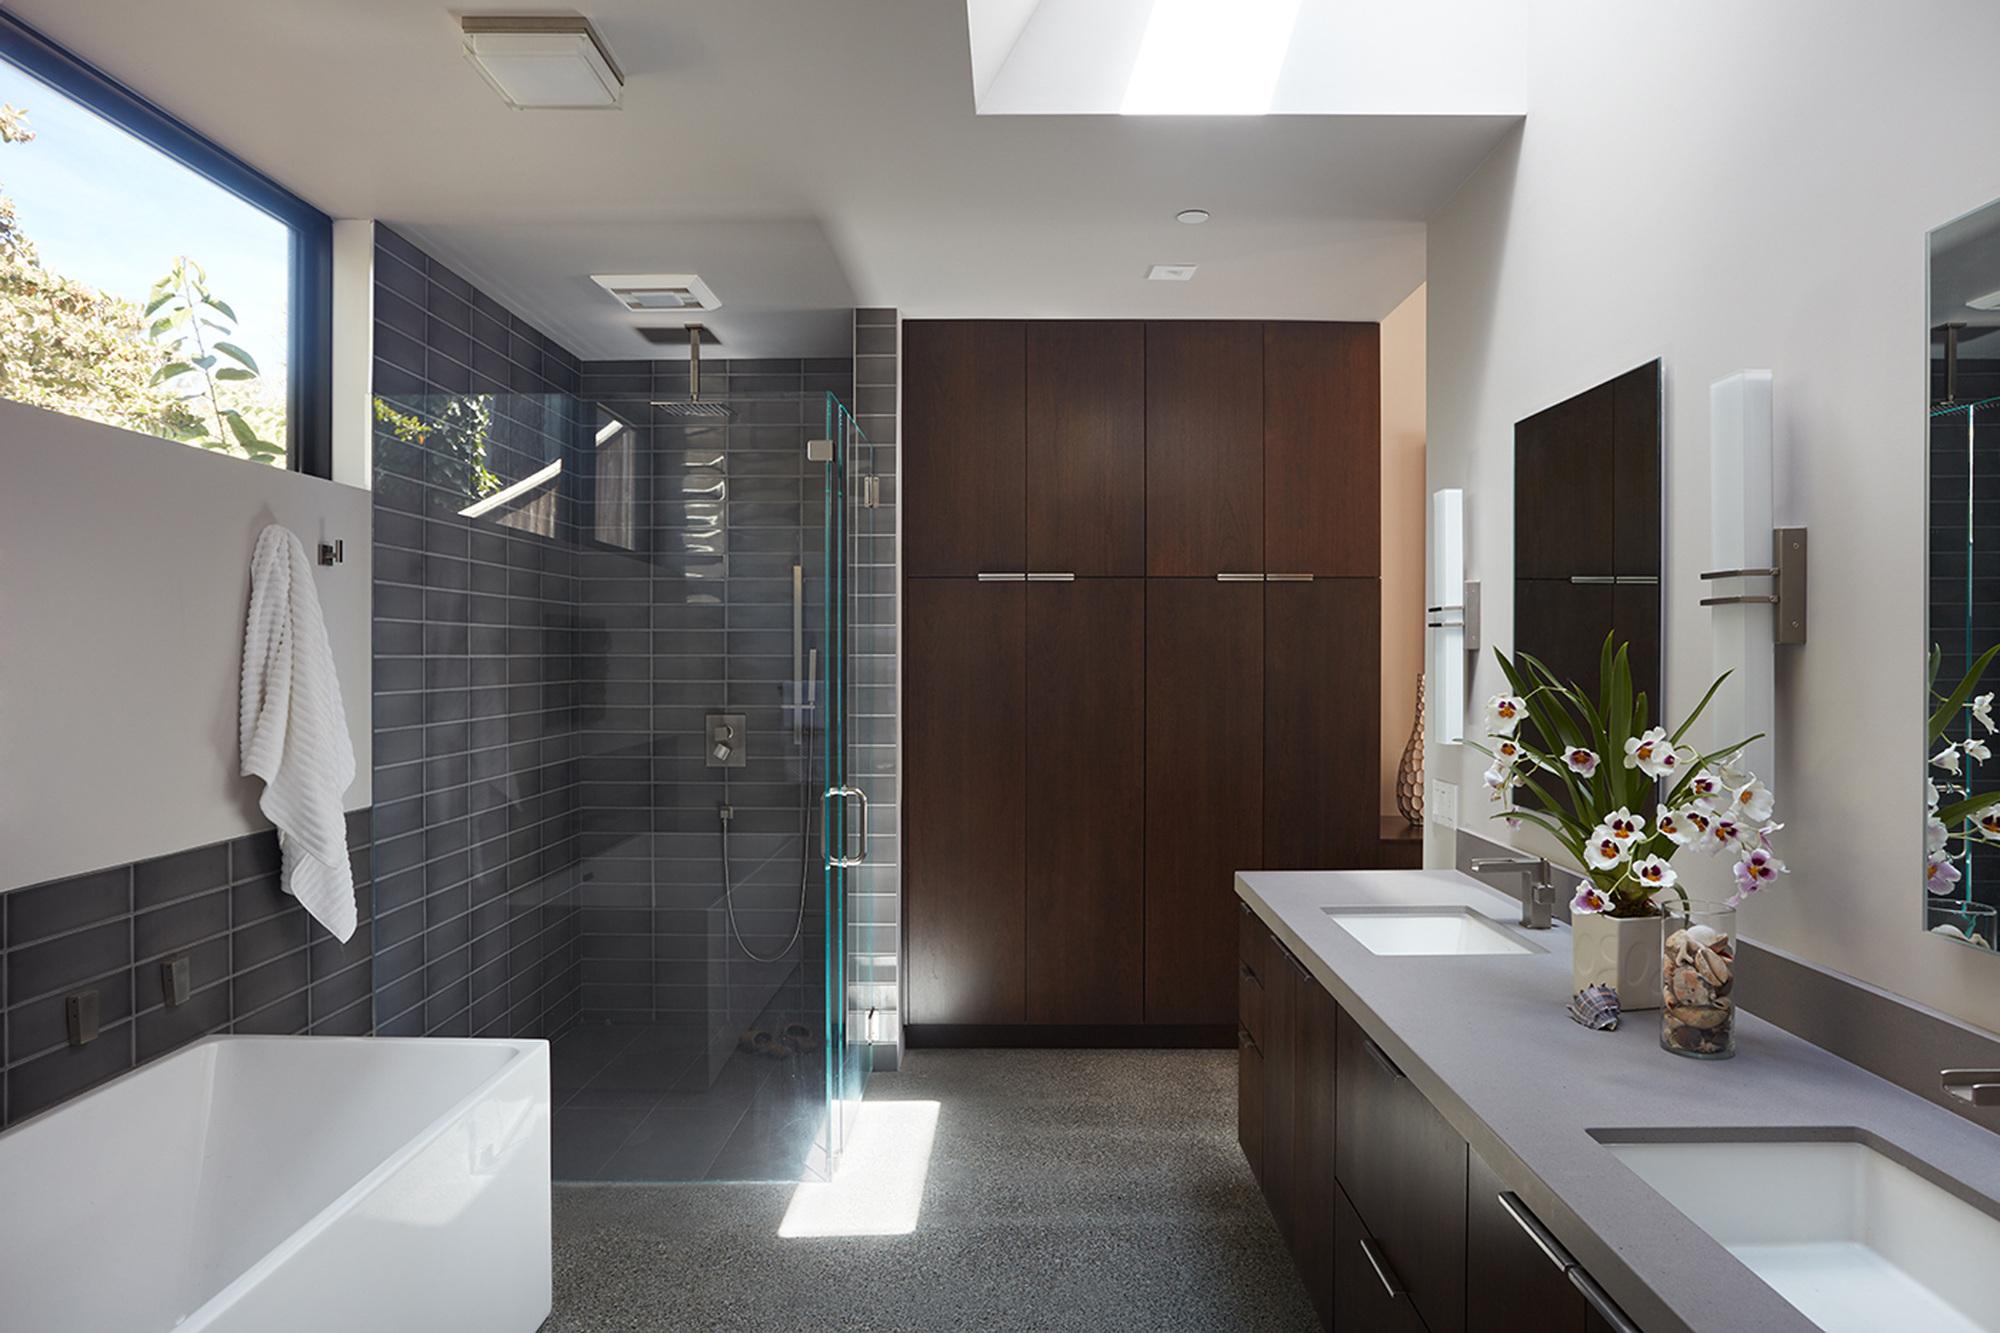 Galer a de casa muro de cristal klopf architecture 15 - Most beautiful bathrooms designs collection ...